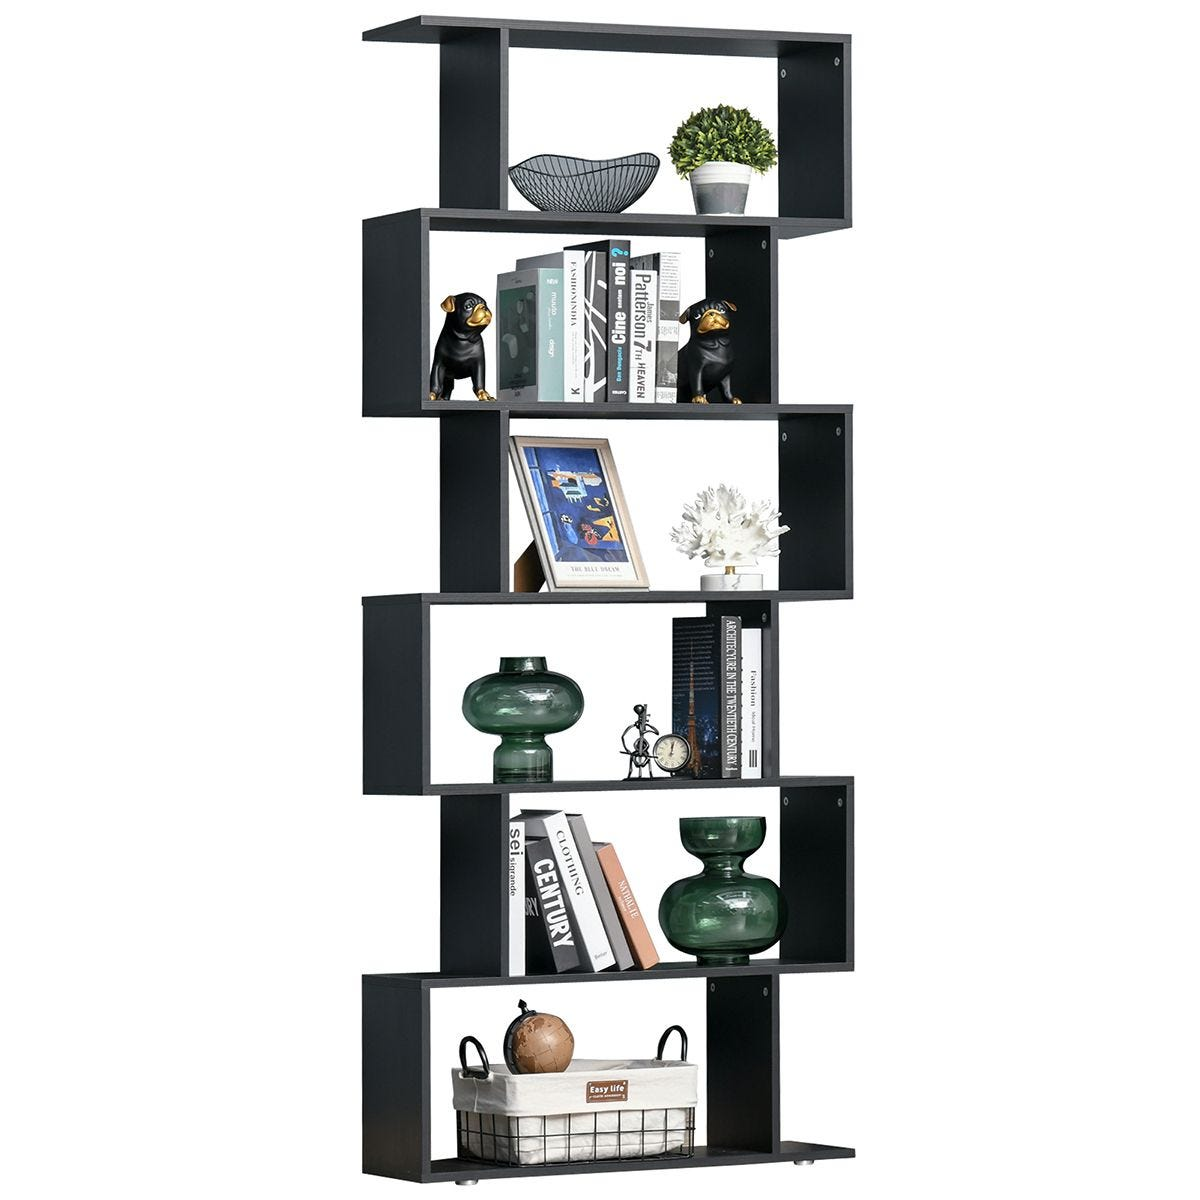 6 Tier Shelf Wood Effect Storage Bookcase S Shape Display Unit Black Wood Effect